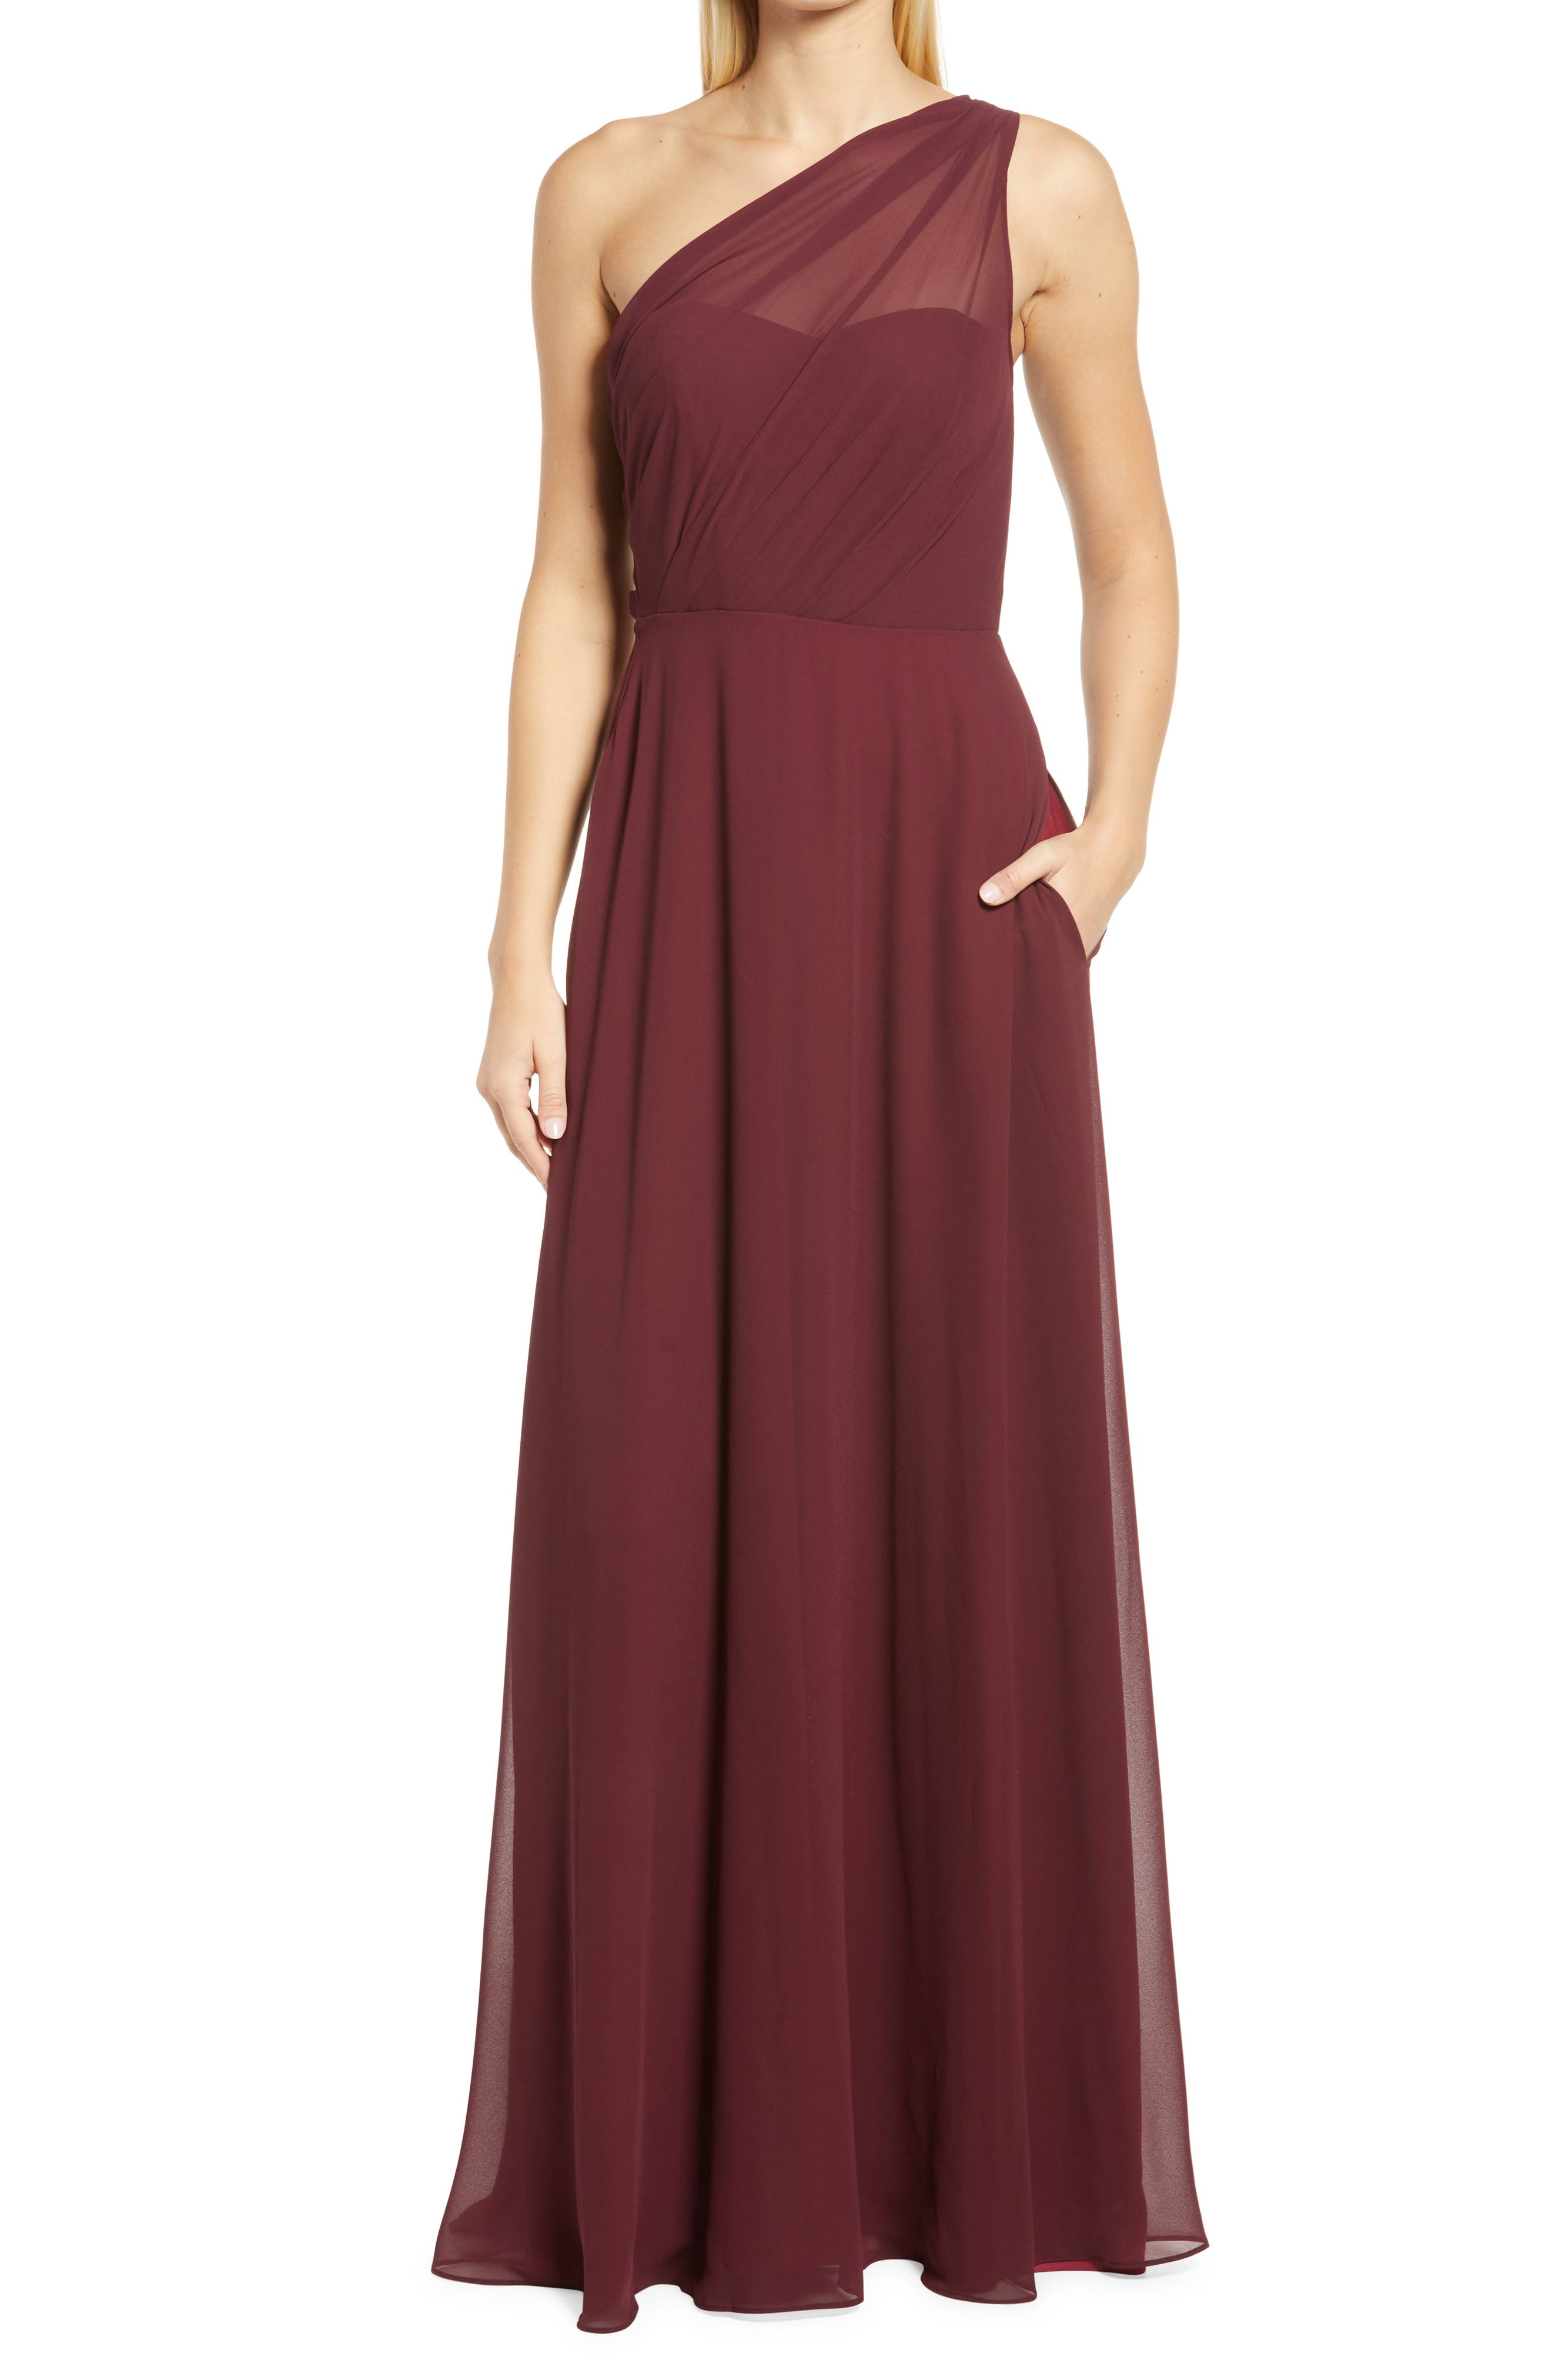 Kira One-Shoulder Evening Gown